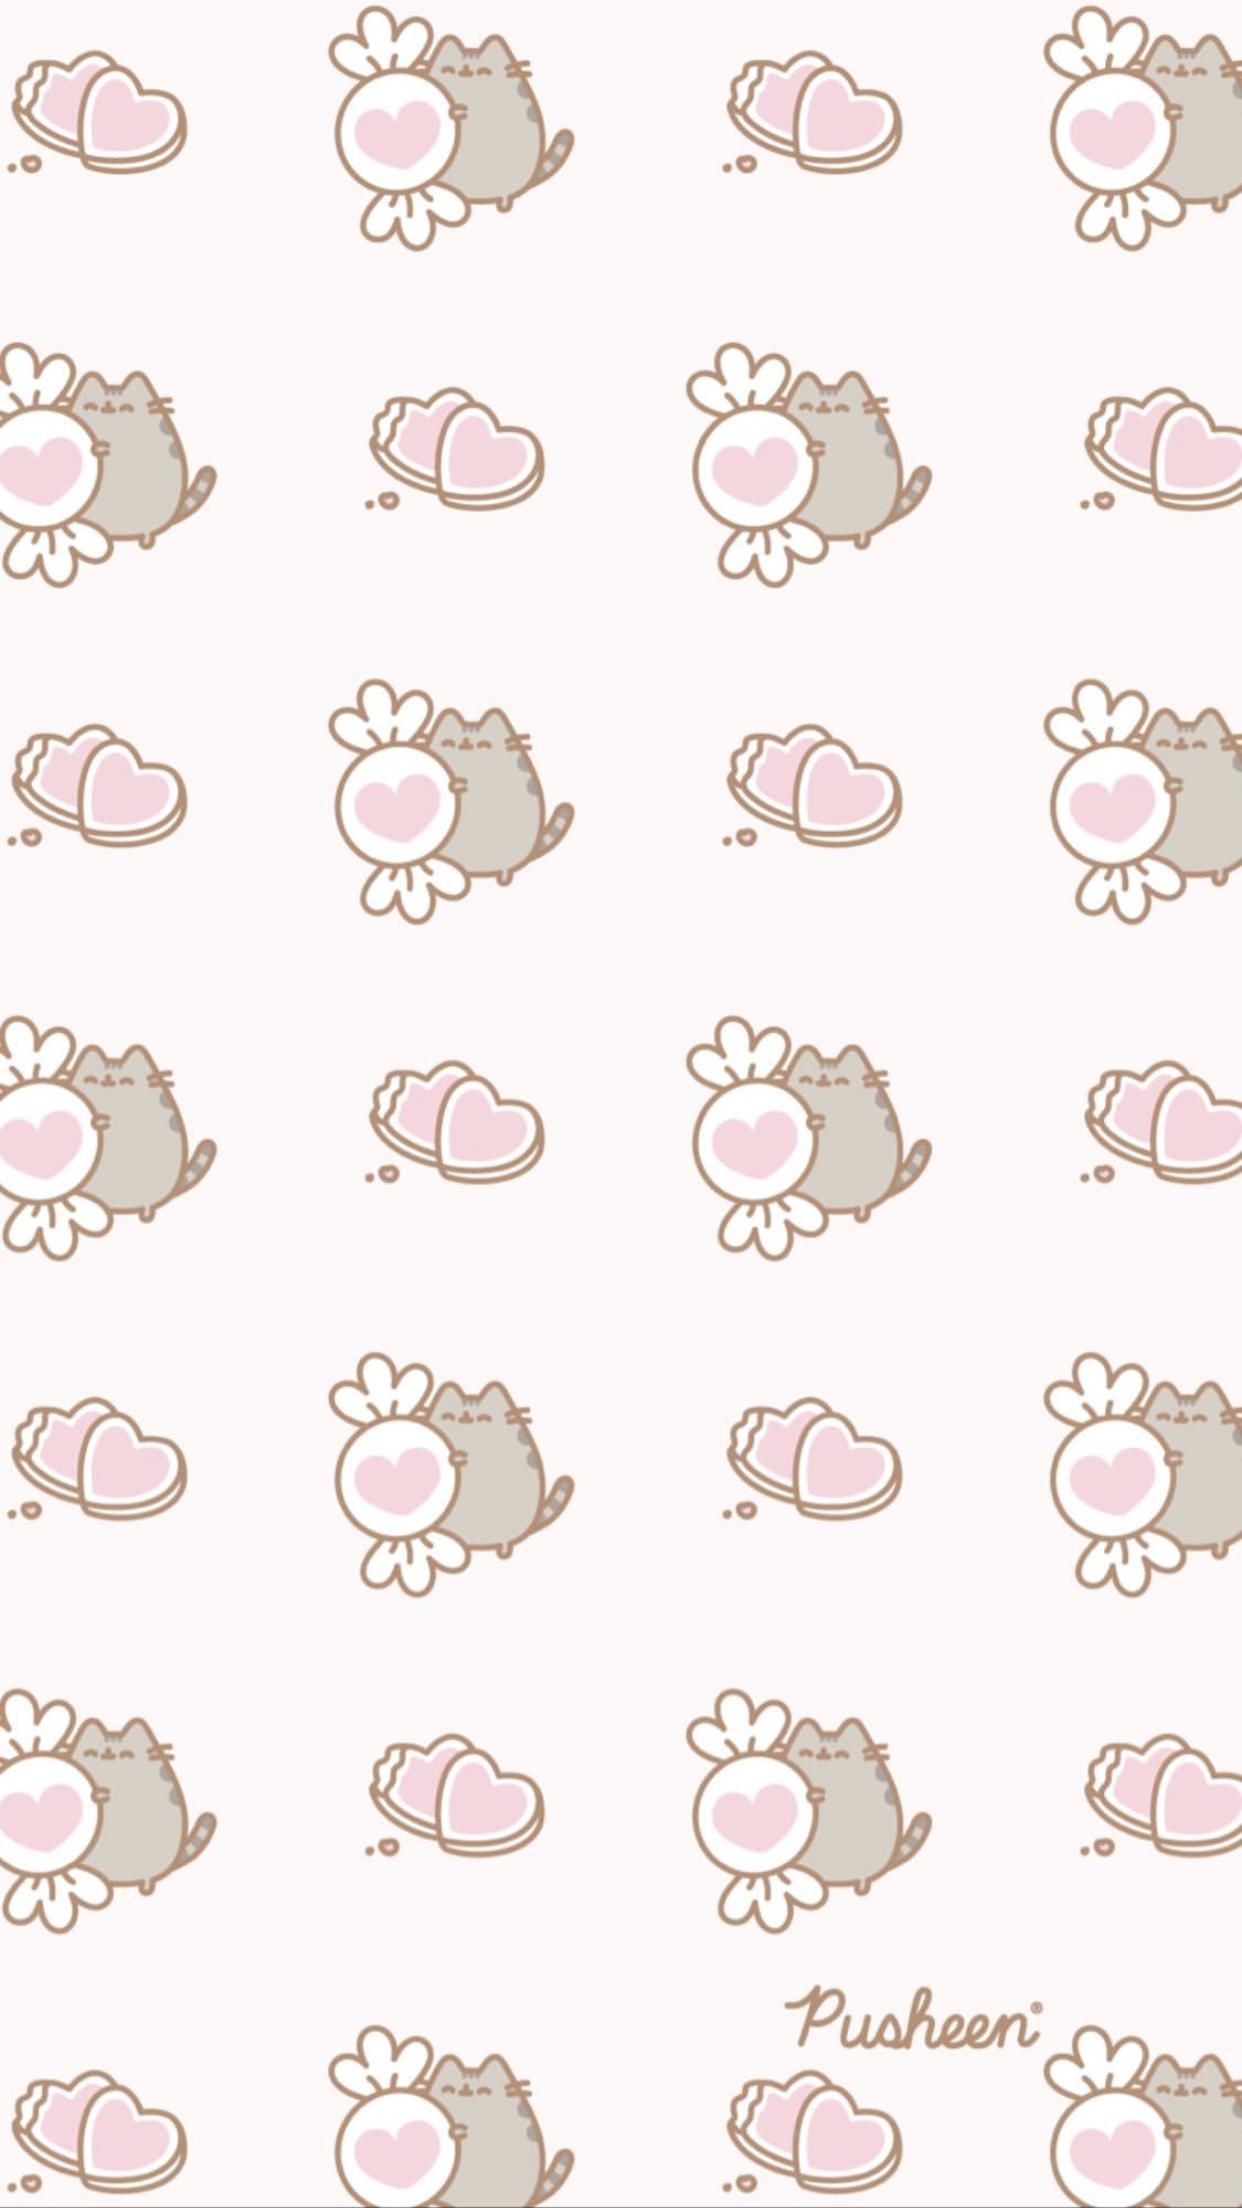 Valentine S Day Pusheen Wallpaper Pusheen Cute Pusheen Valentines Kawaii Wallpaper